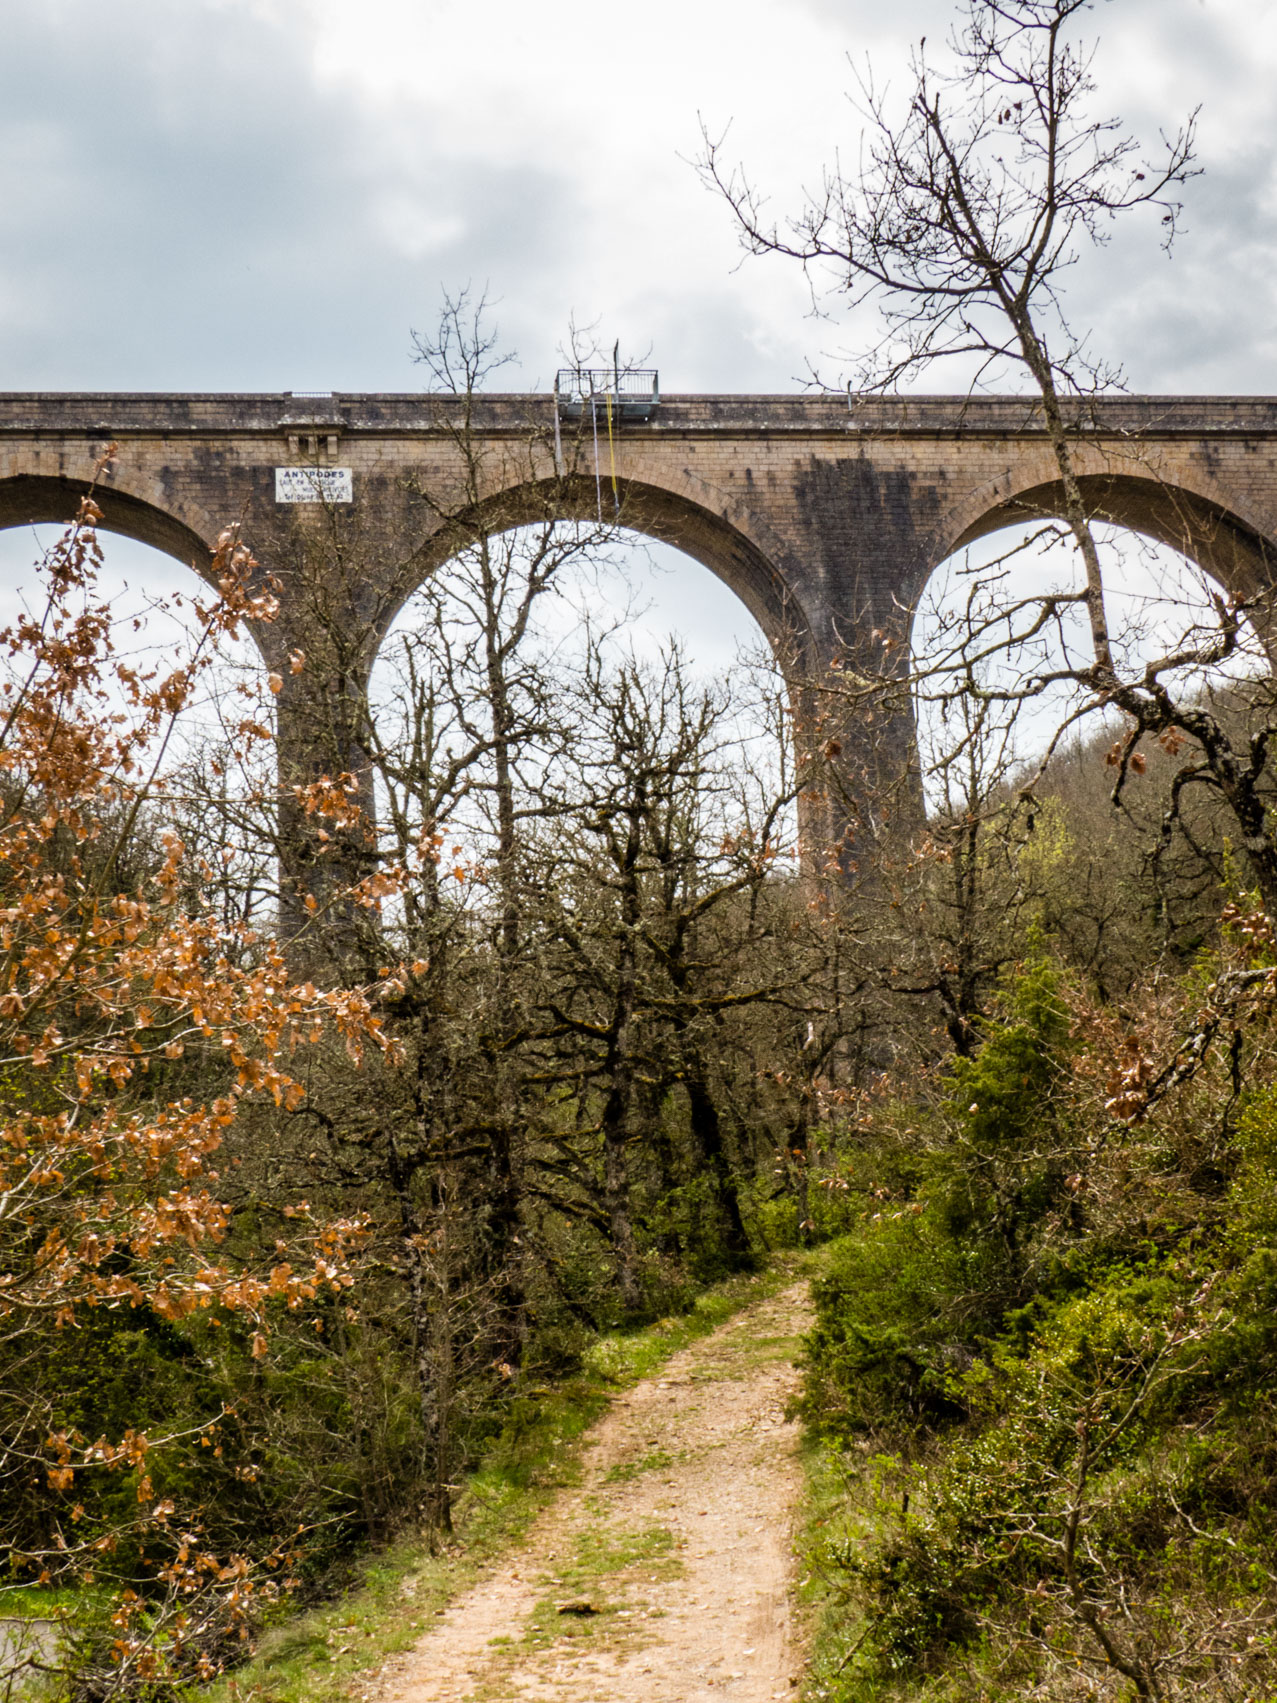 Viaduc de Sainte Eulalie vu du bas